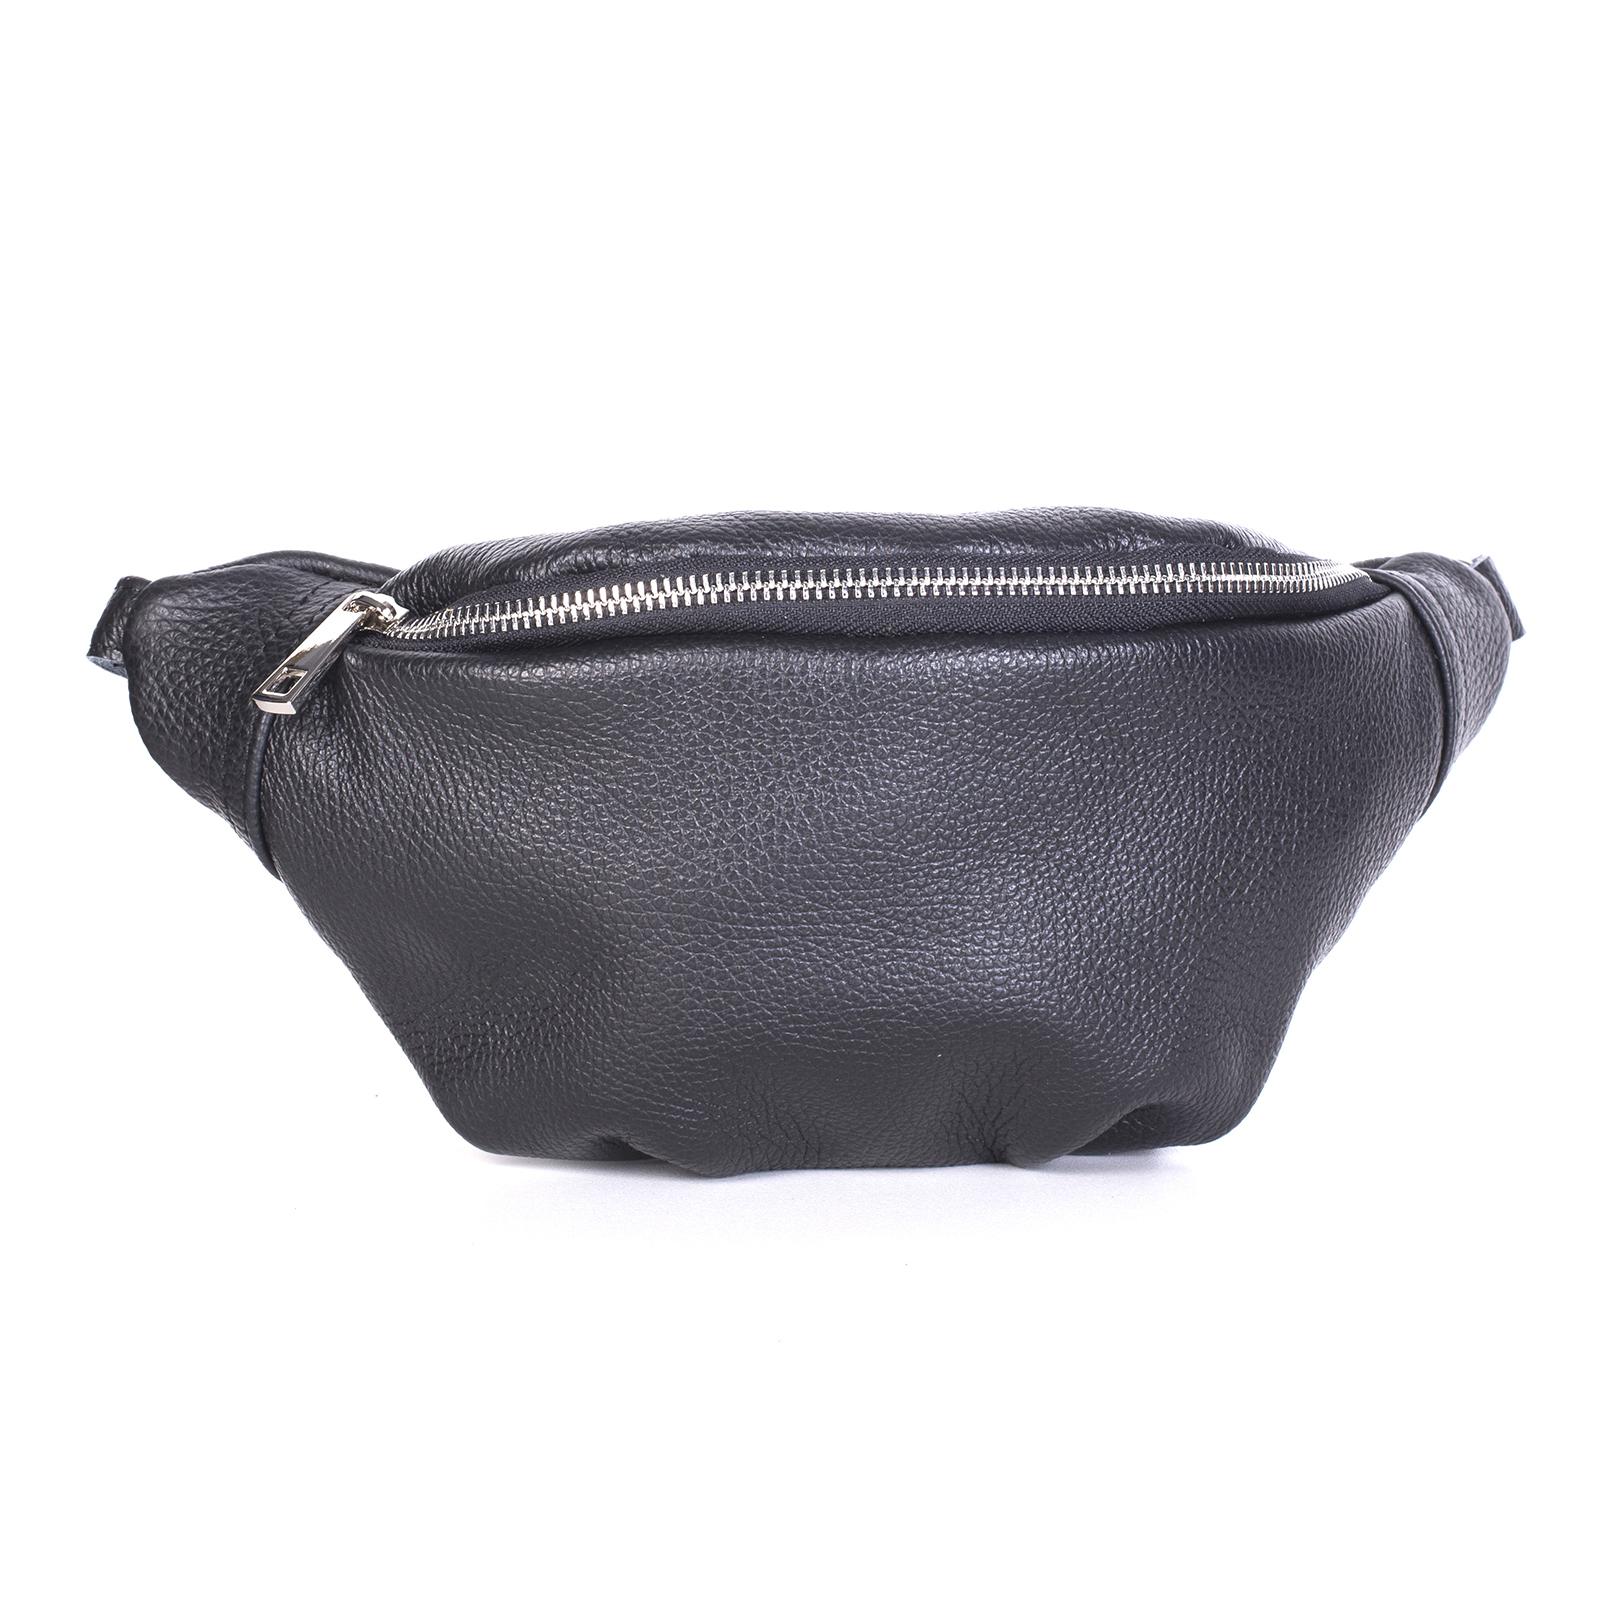 Fanny pack, UNO, Missy (черный)